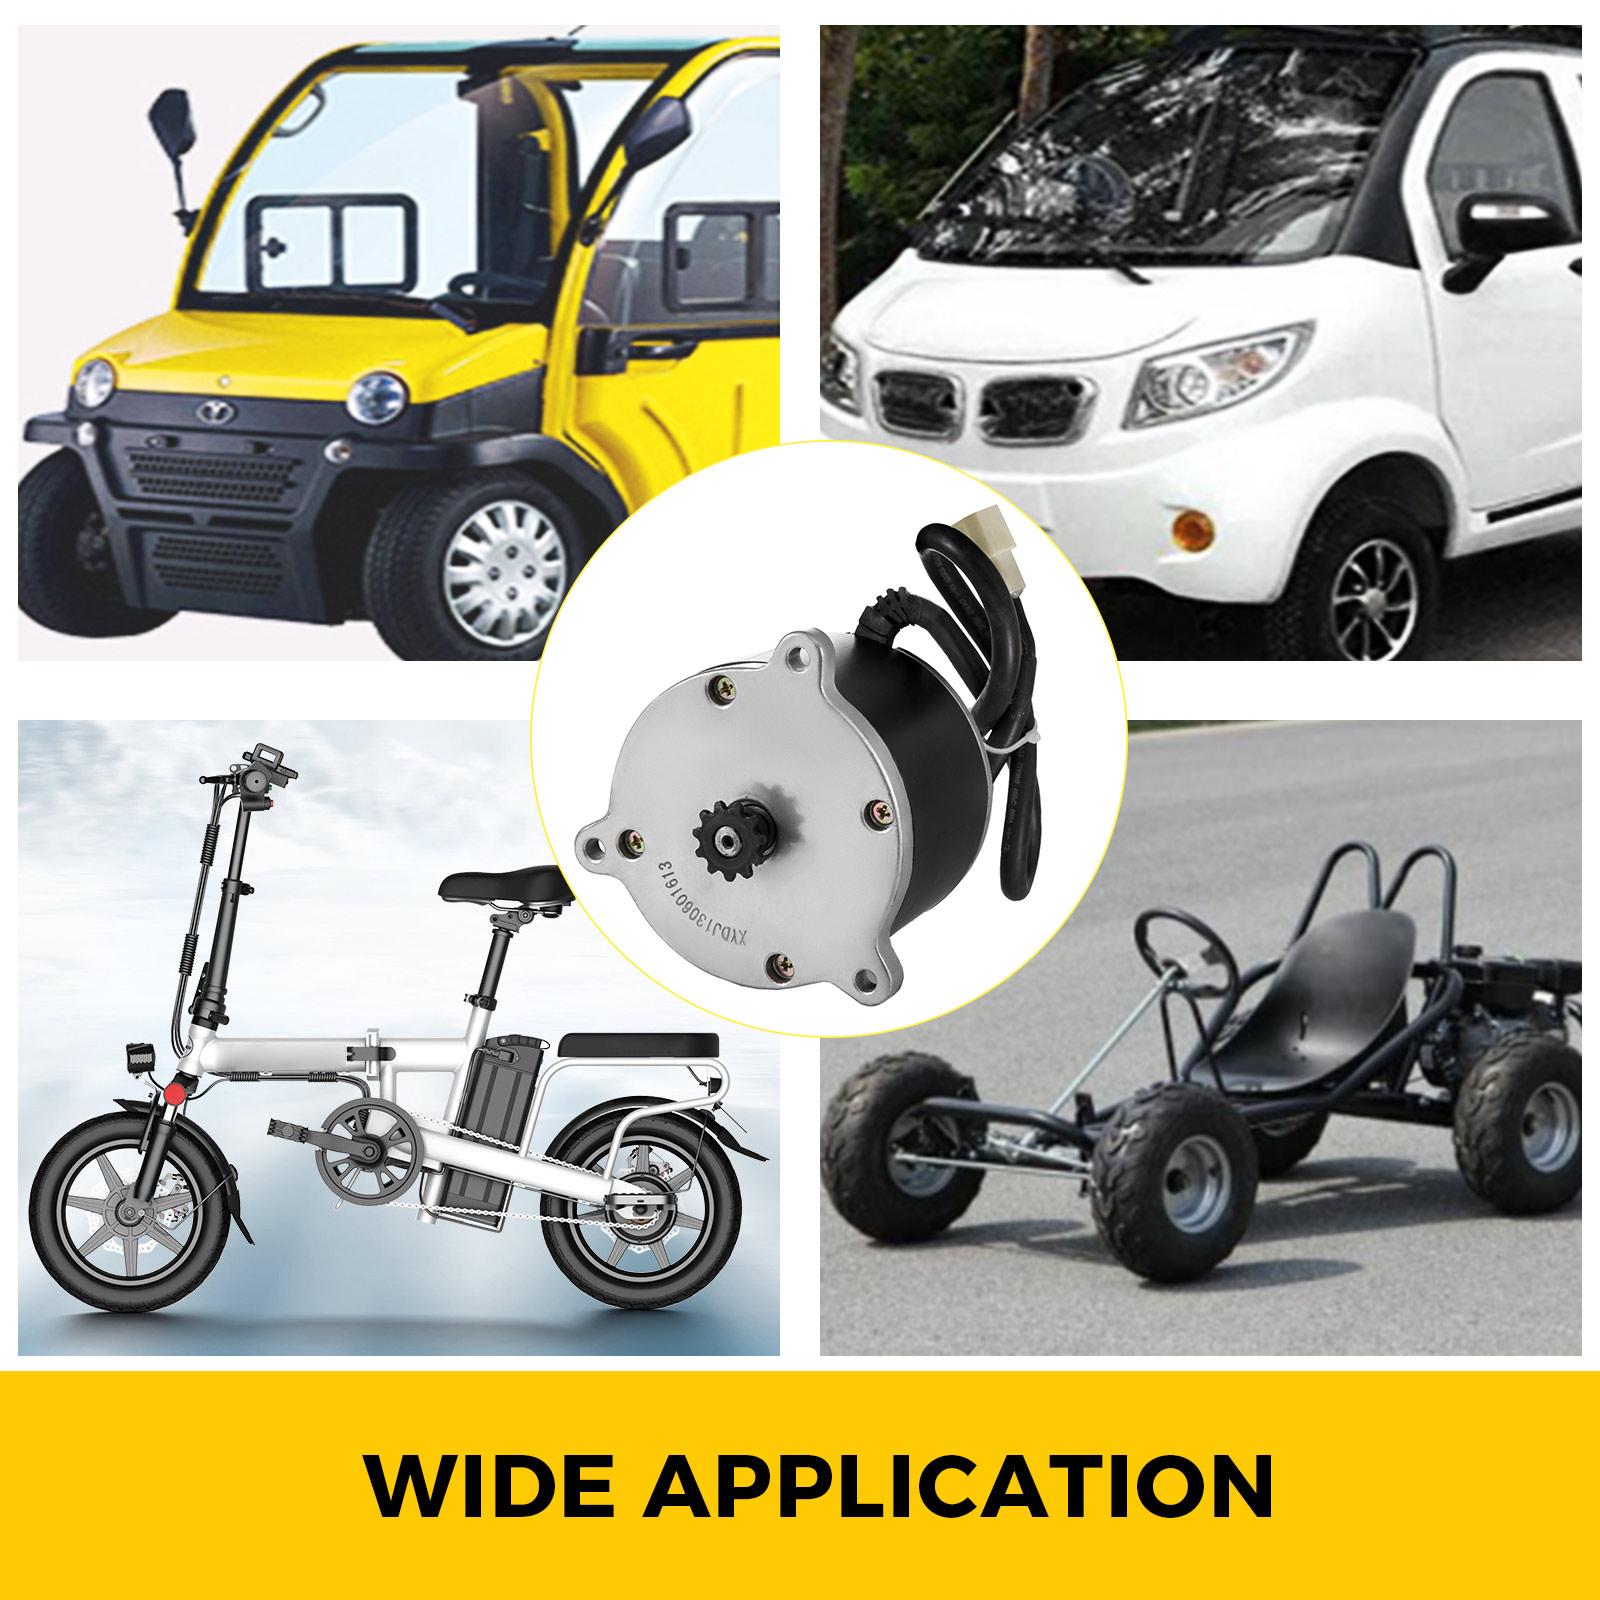 24V-500W-3500RPM-Electric-Motor-f-scooter-bike-go-kart-minibike-MY1016 thumbnail 43